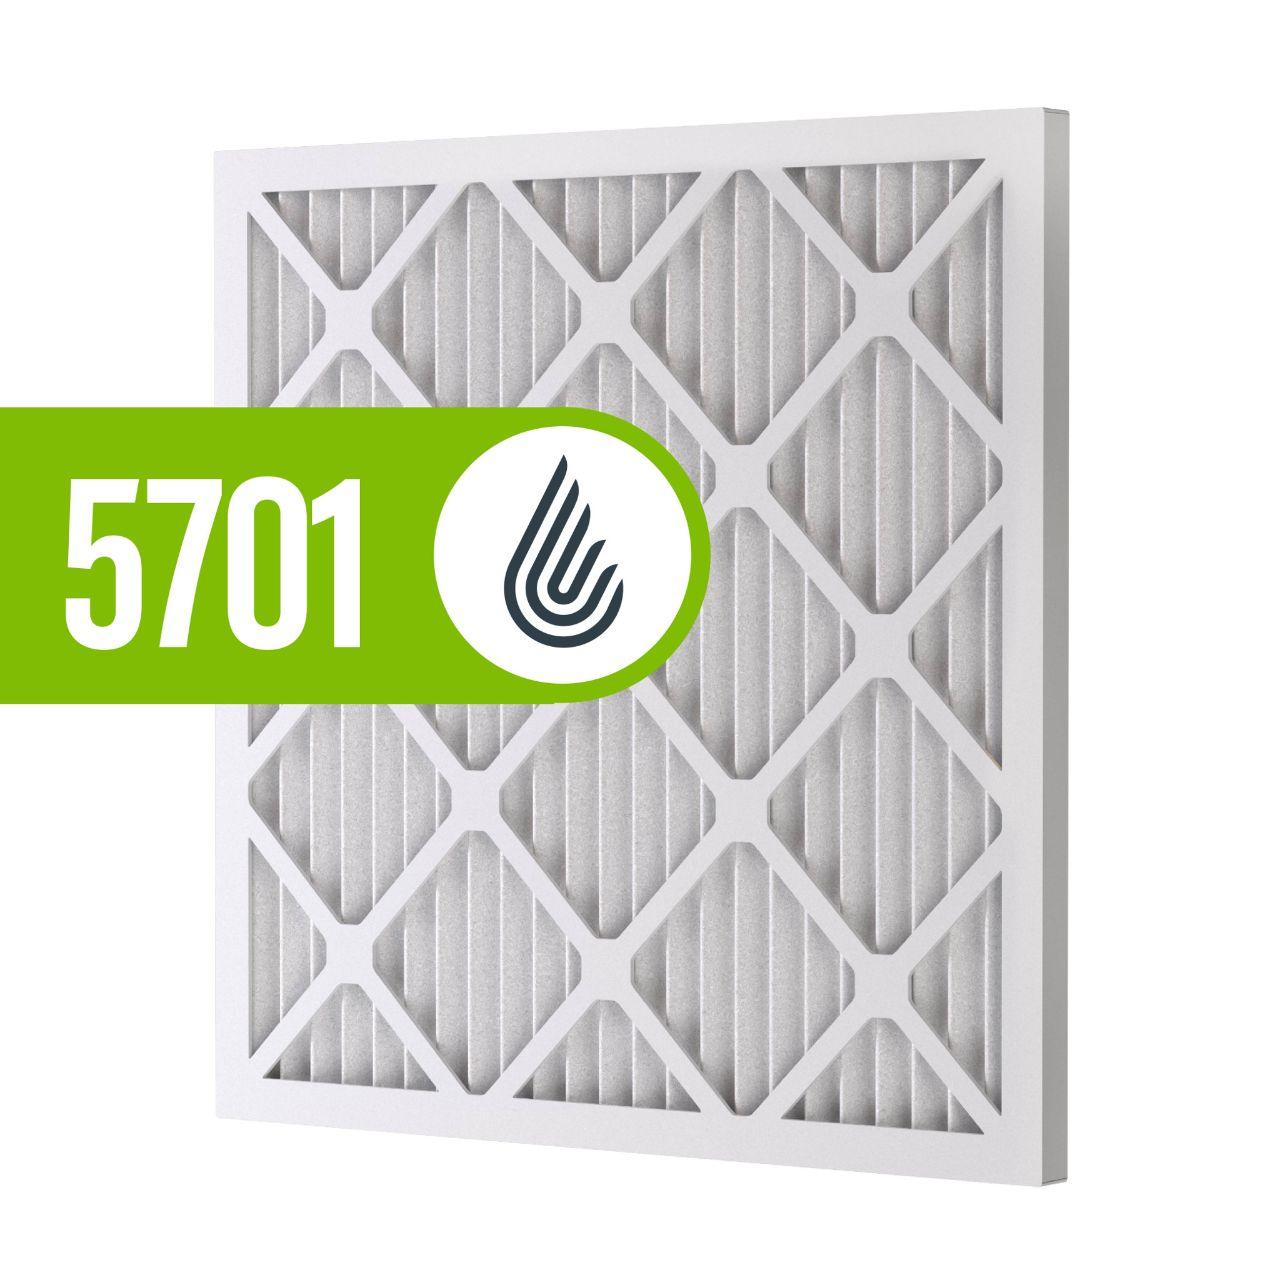 anden-5701-dehumidifier-filter-web-ready-hero-photo